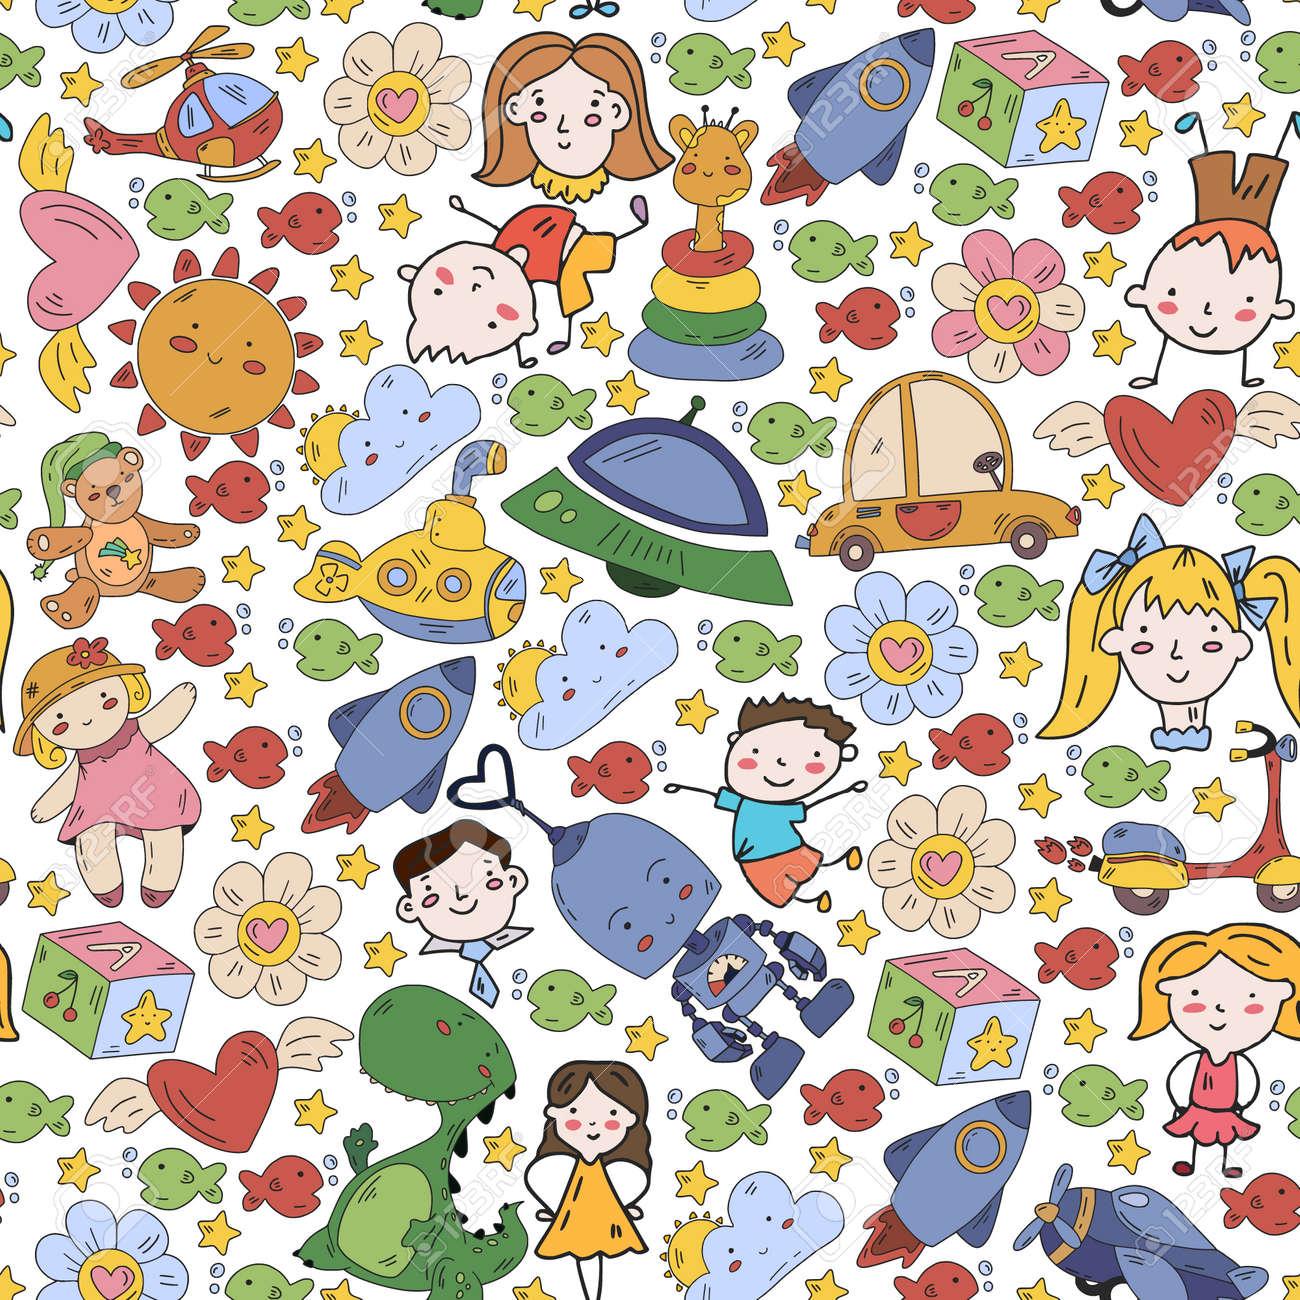 Children play with toys in the kindergarten. Kids playground. Education, creativity, imagination. - 173211554